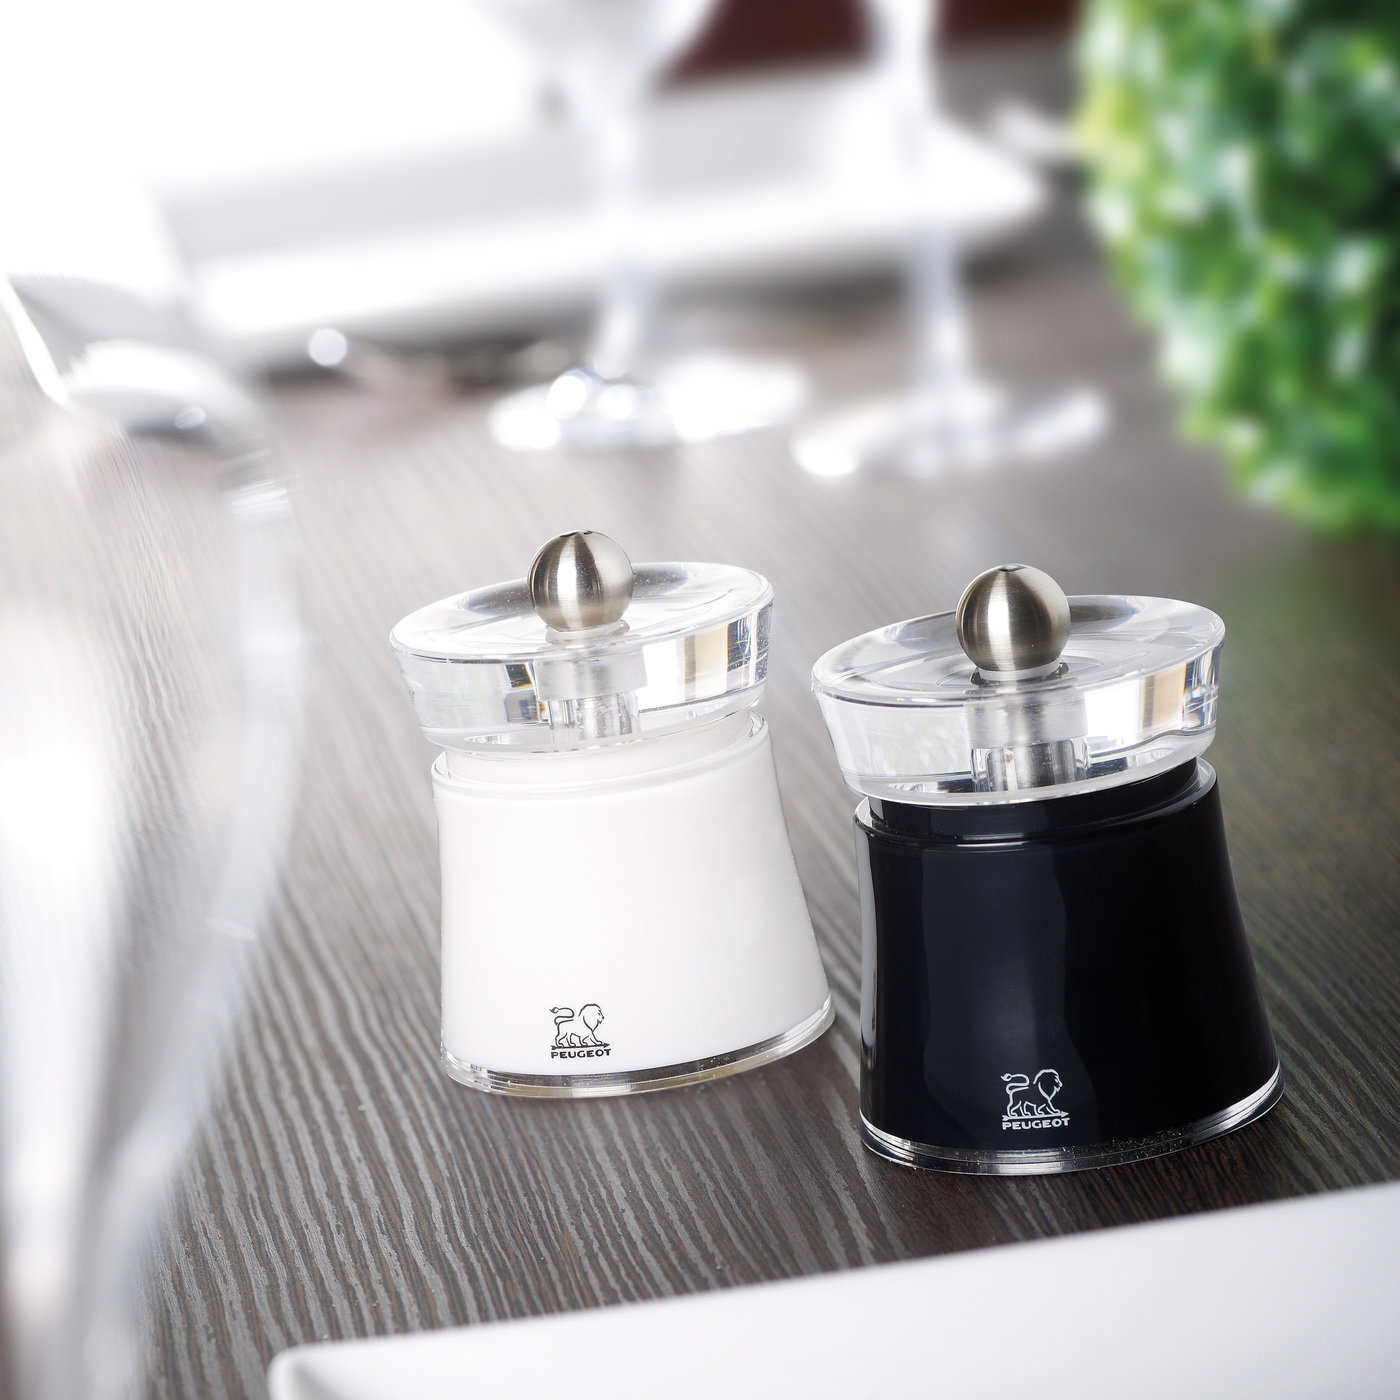 Bali Salt Pepper Mills For Peugeot By